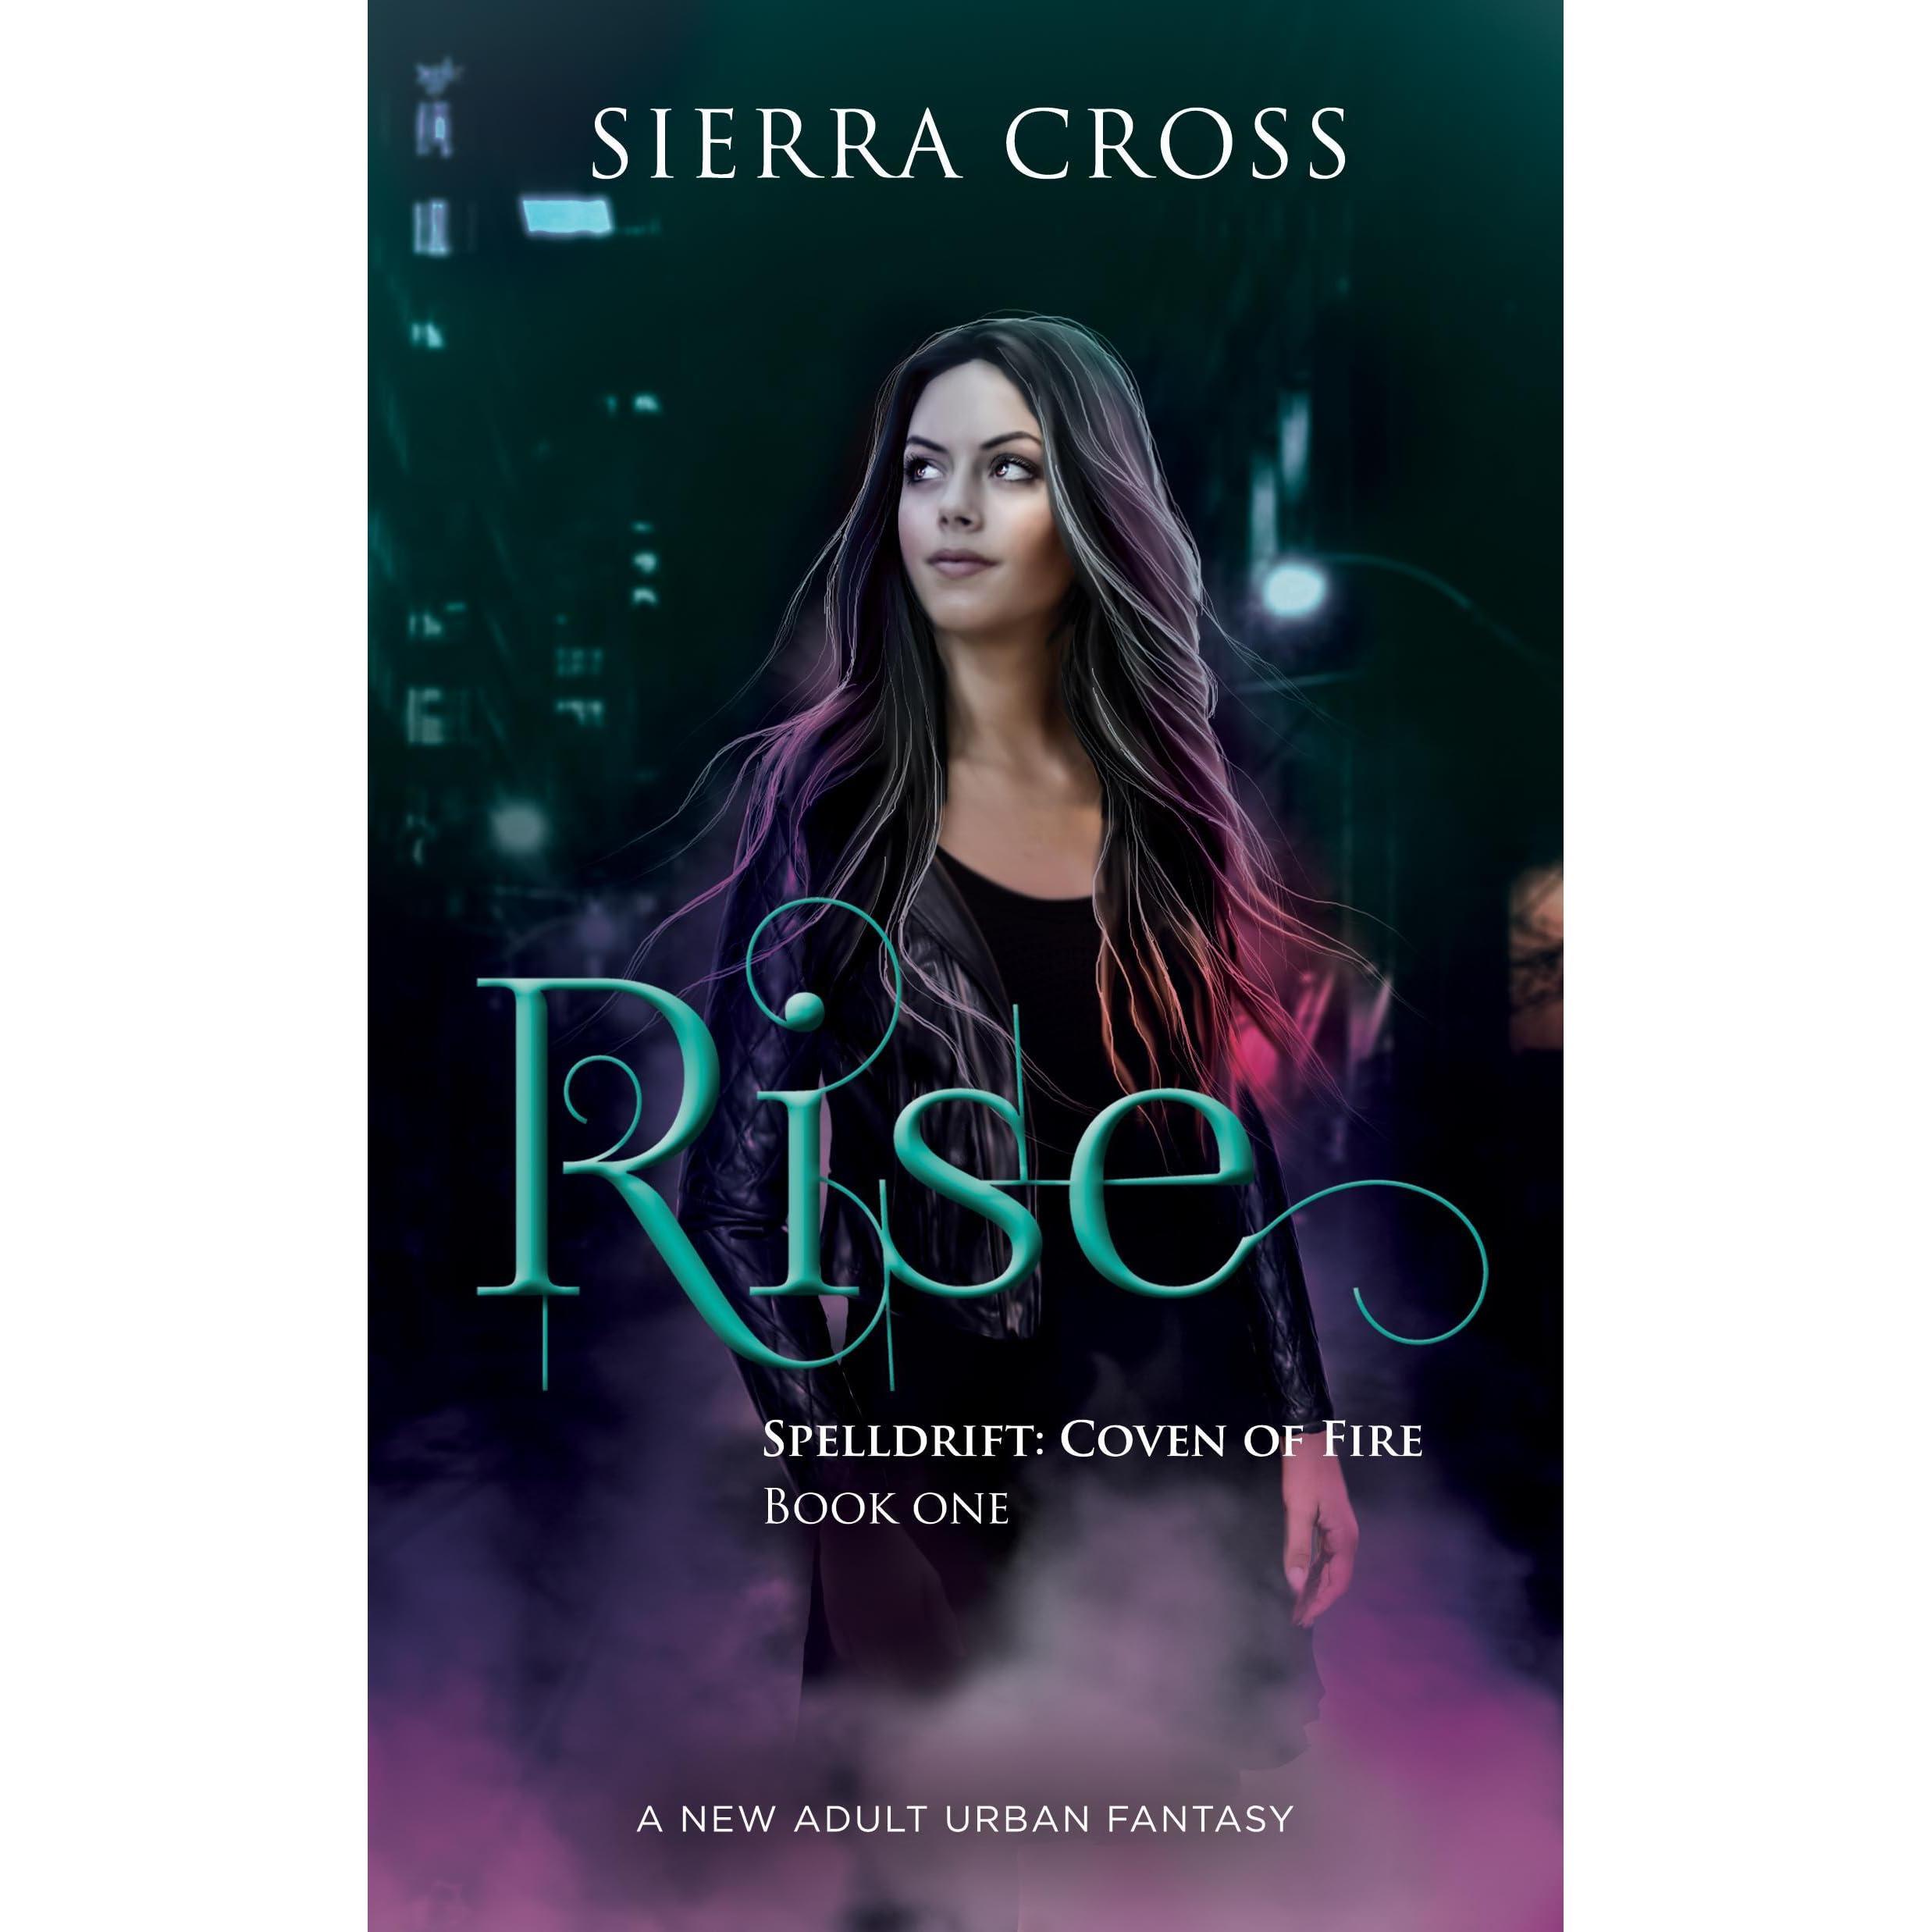 Rise (Spelldrift: Coven of Fire, #1) by Sierra Cross